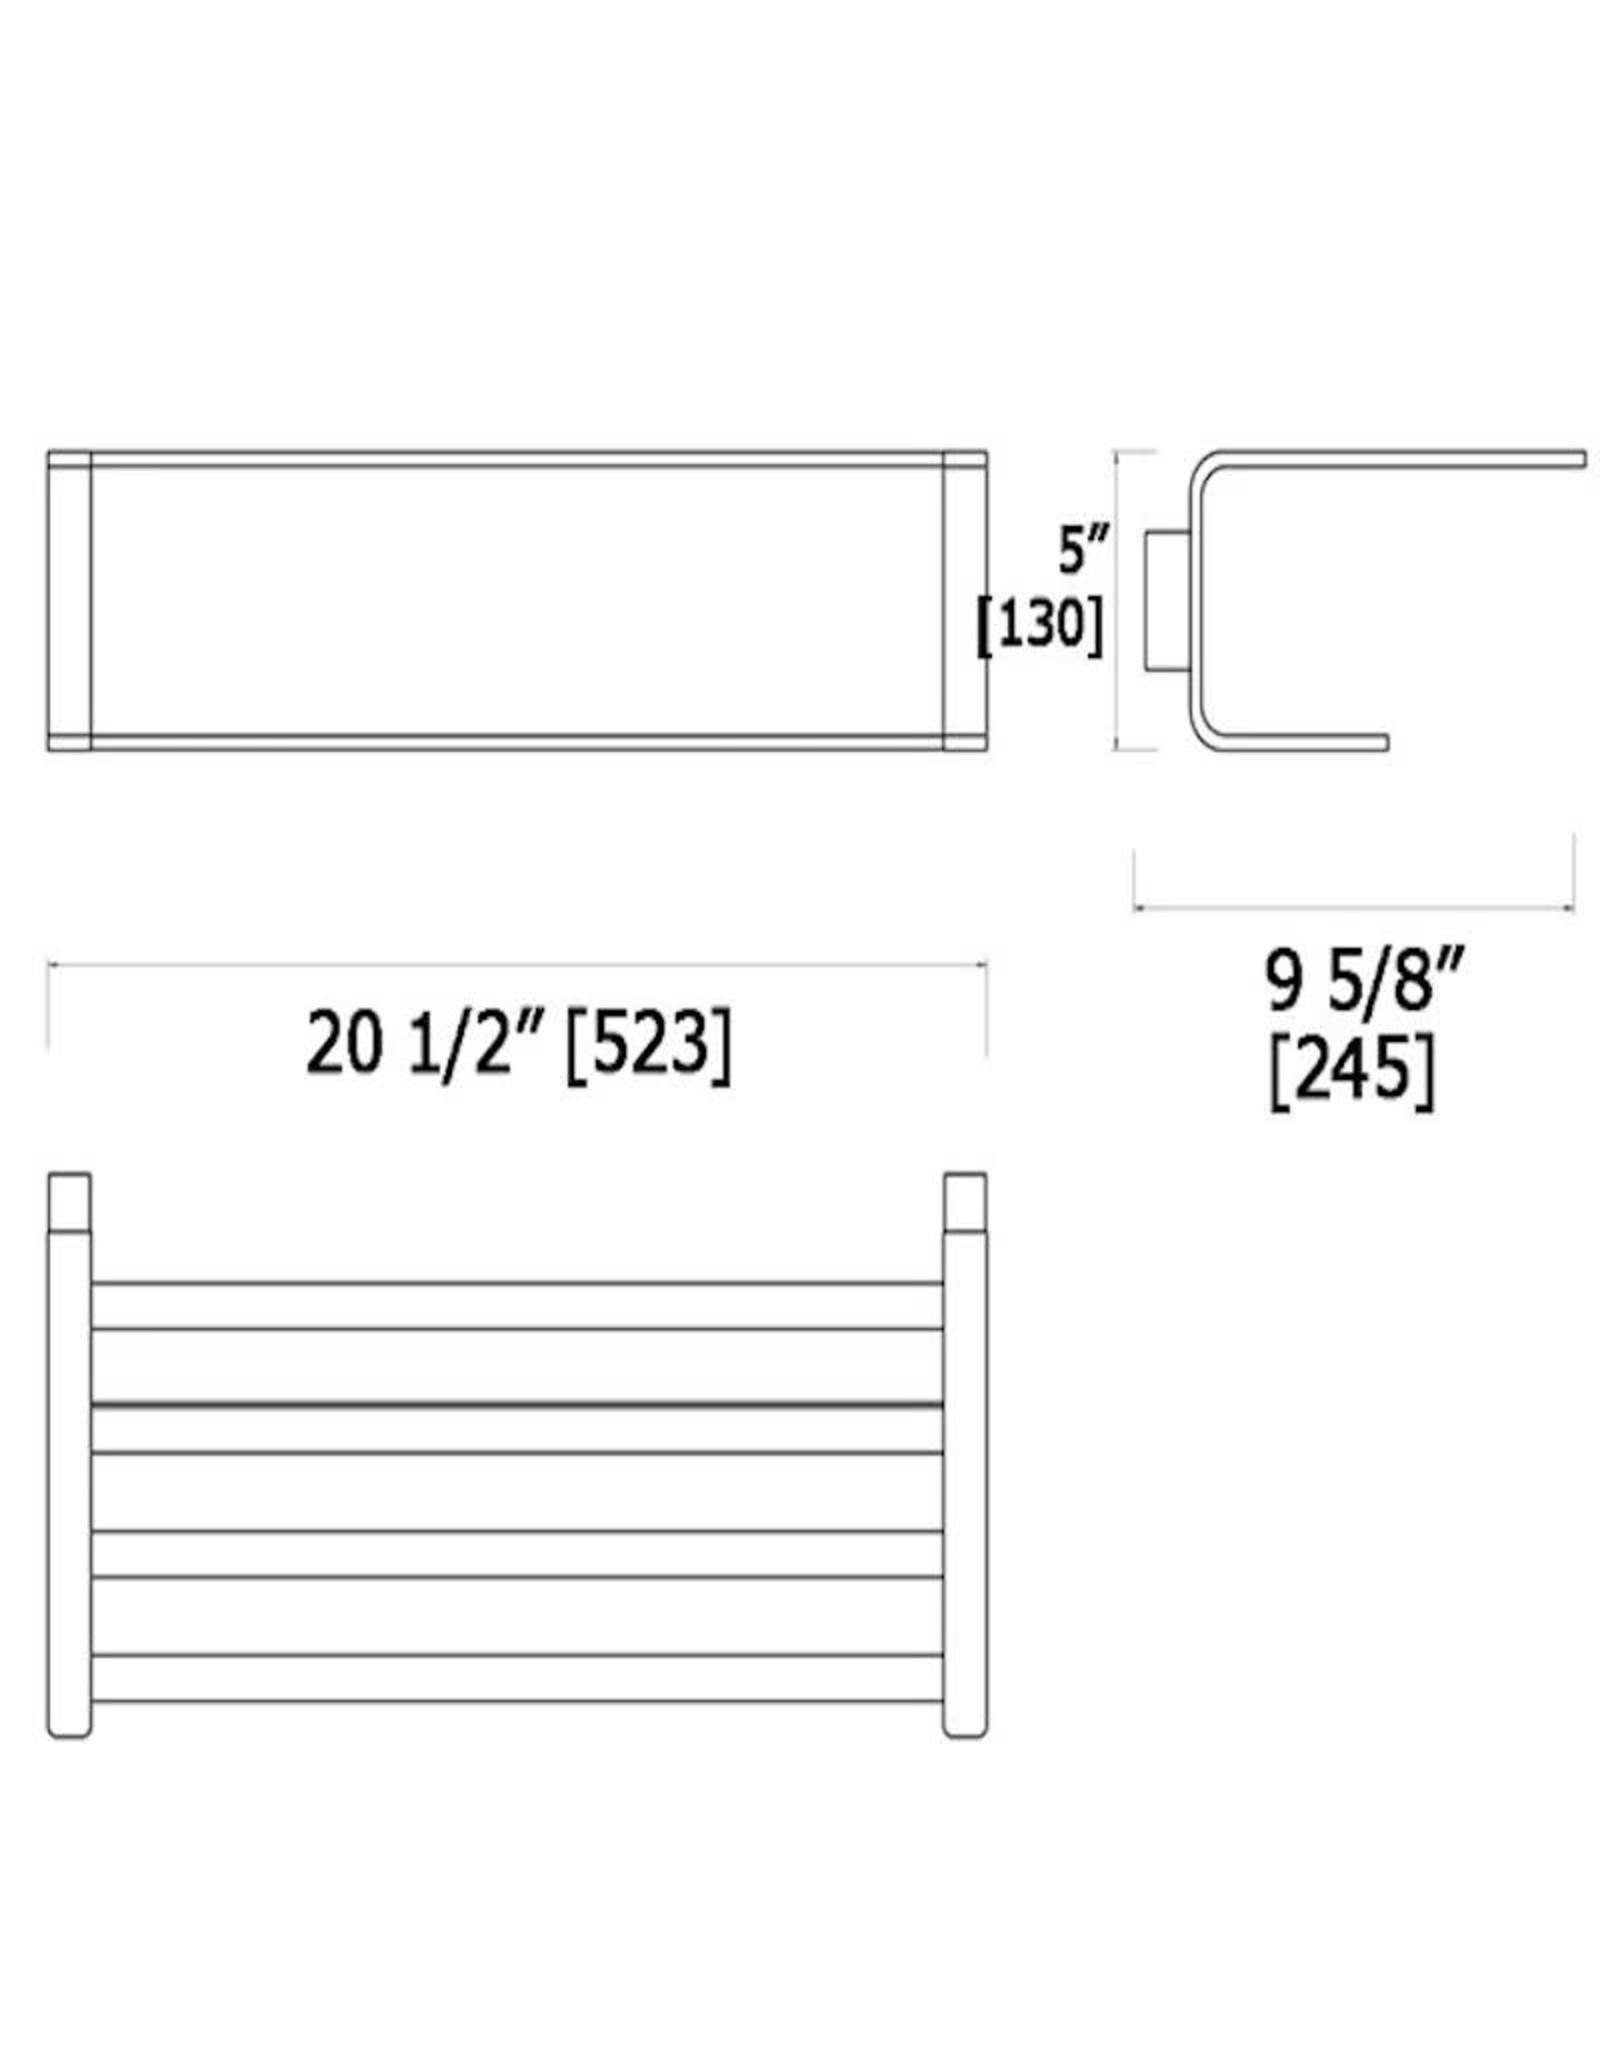 LalOO Laloo Hotel Shelf w/ Single Towel Bar